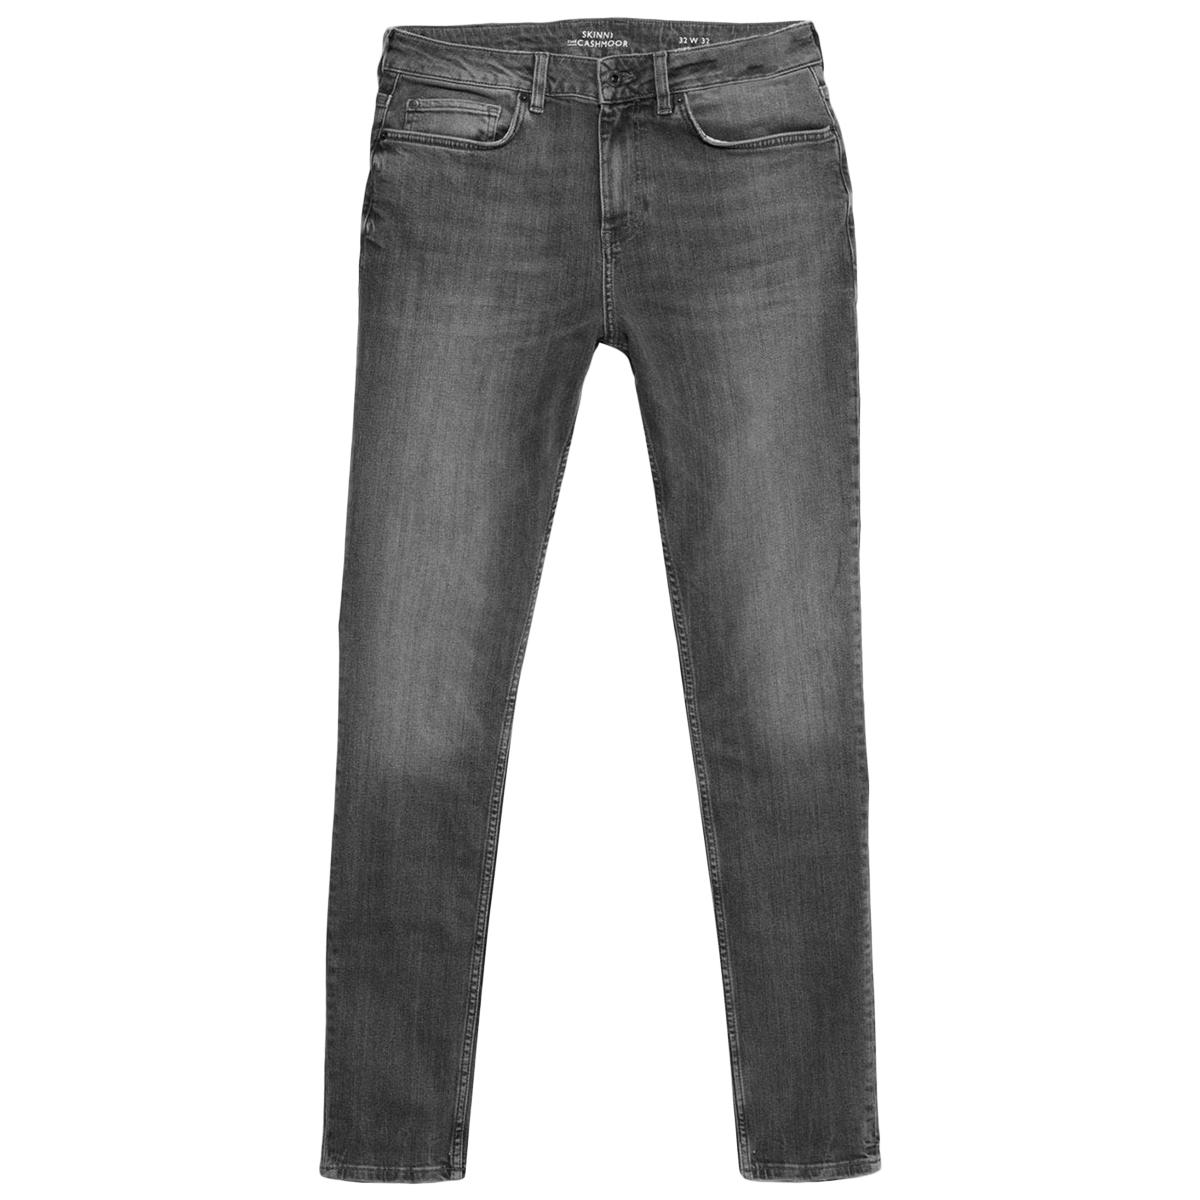 Jack Wills Men's Cashmoor Skinny Jeans - Black, 34/R